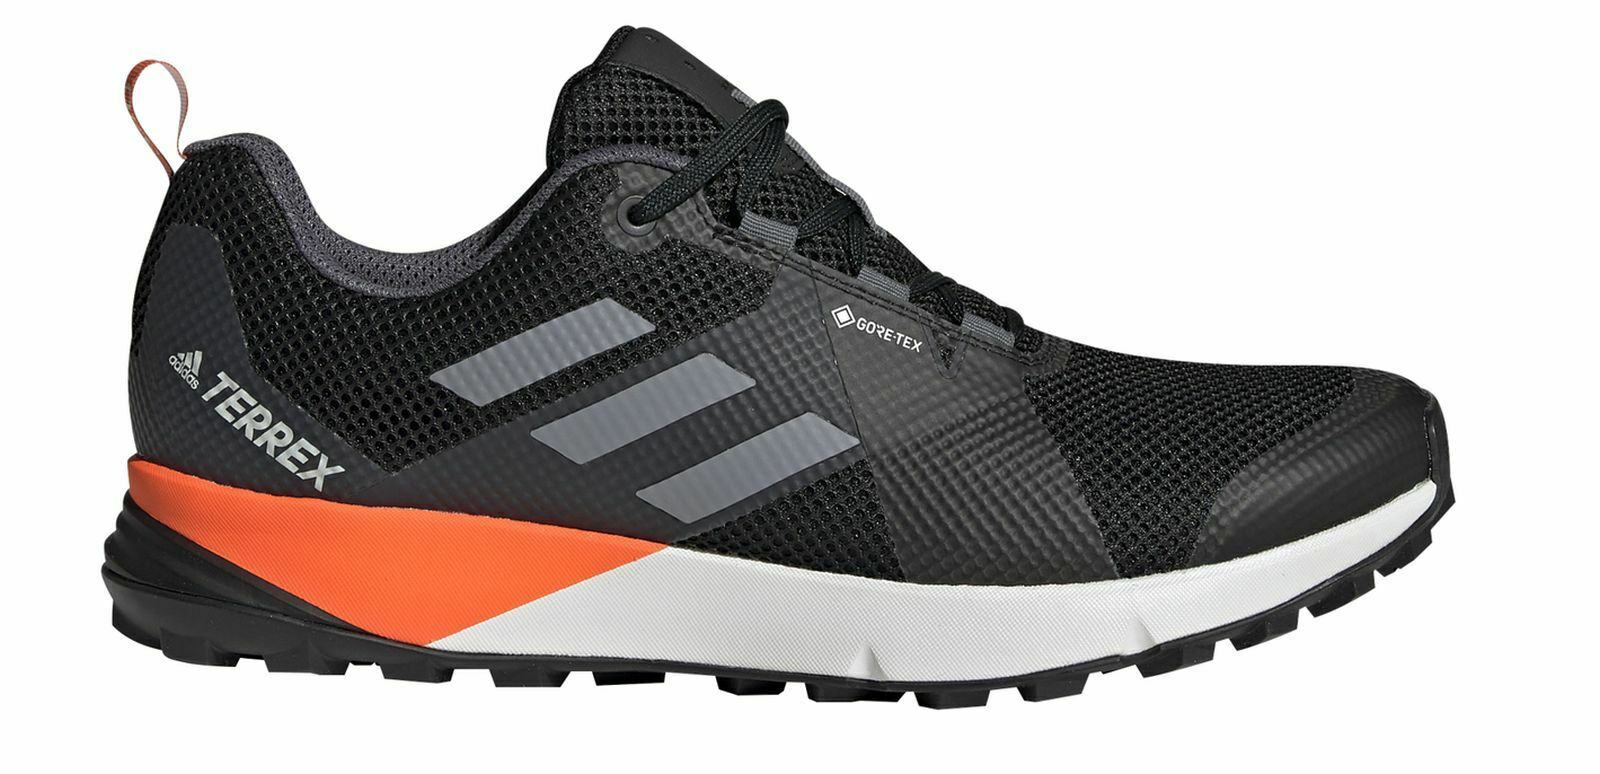 Adidas Performance Herren Trekking Schuh TERREX Two GTX schwarz Orange